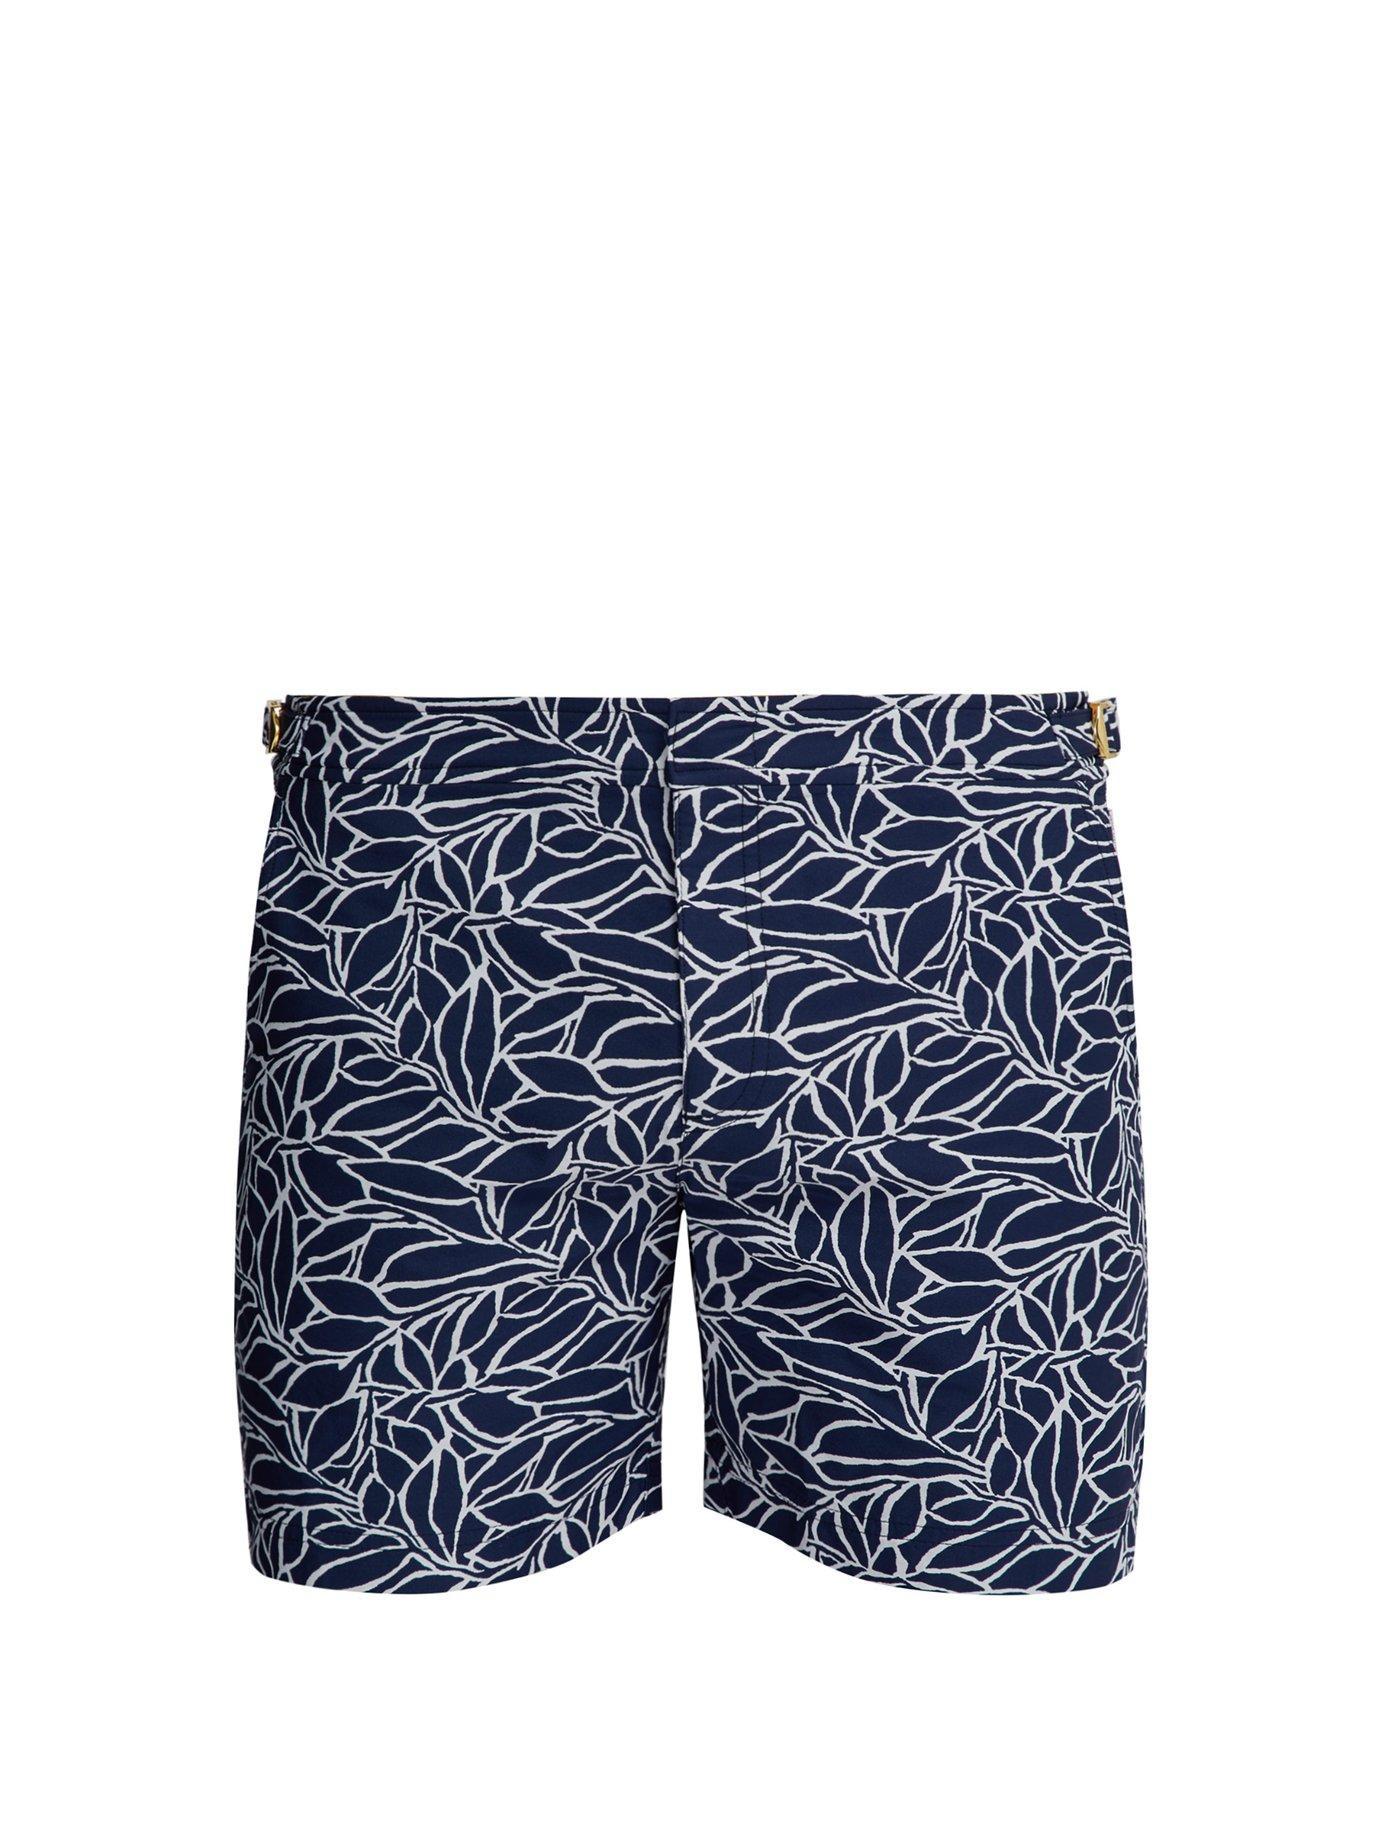 7bab8393ffc Orlebar Brown. Men's Blue Bulldog X Alaria Abstract Jacquard Swimshorts